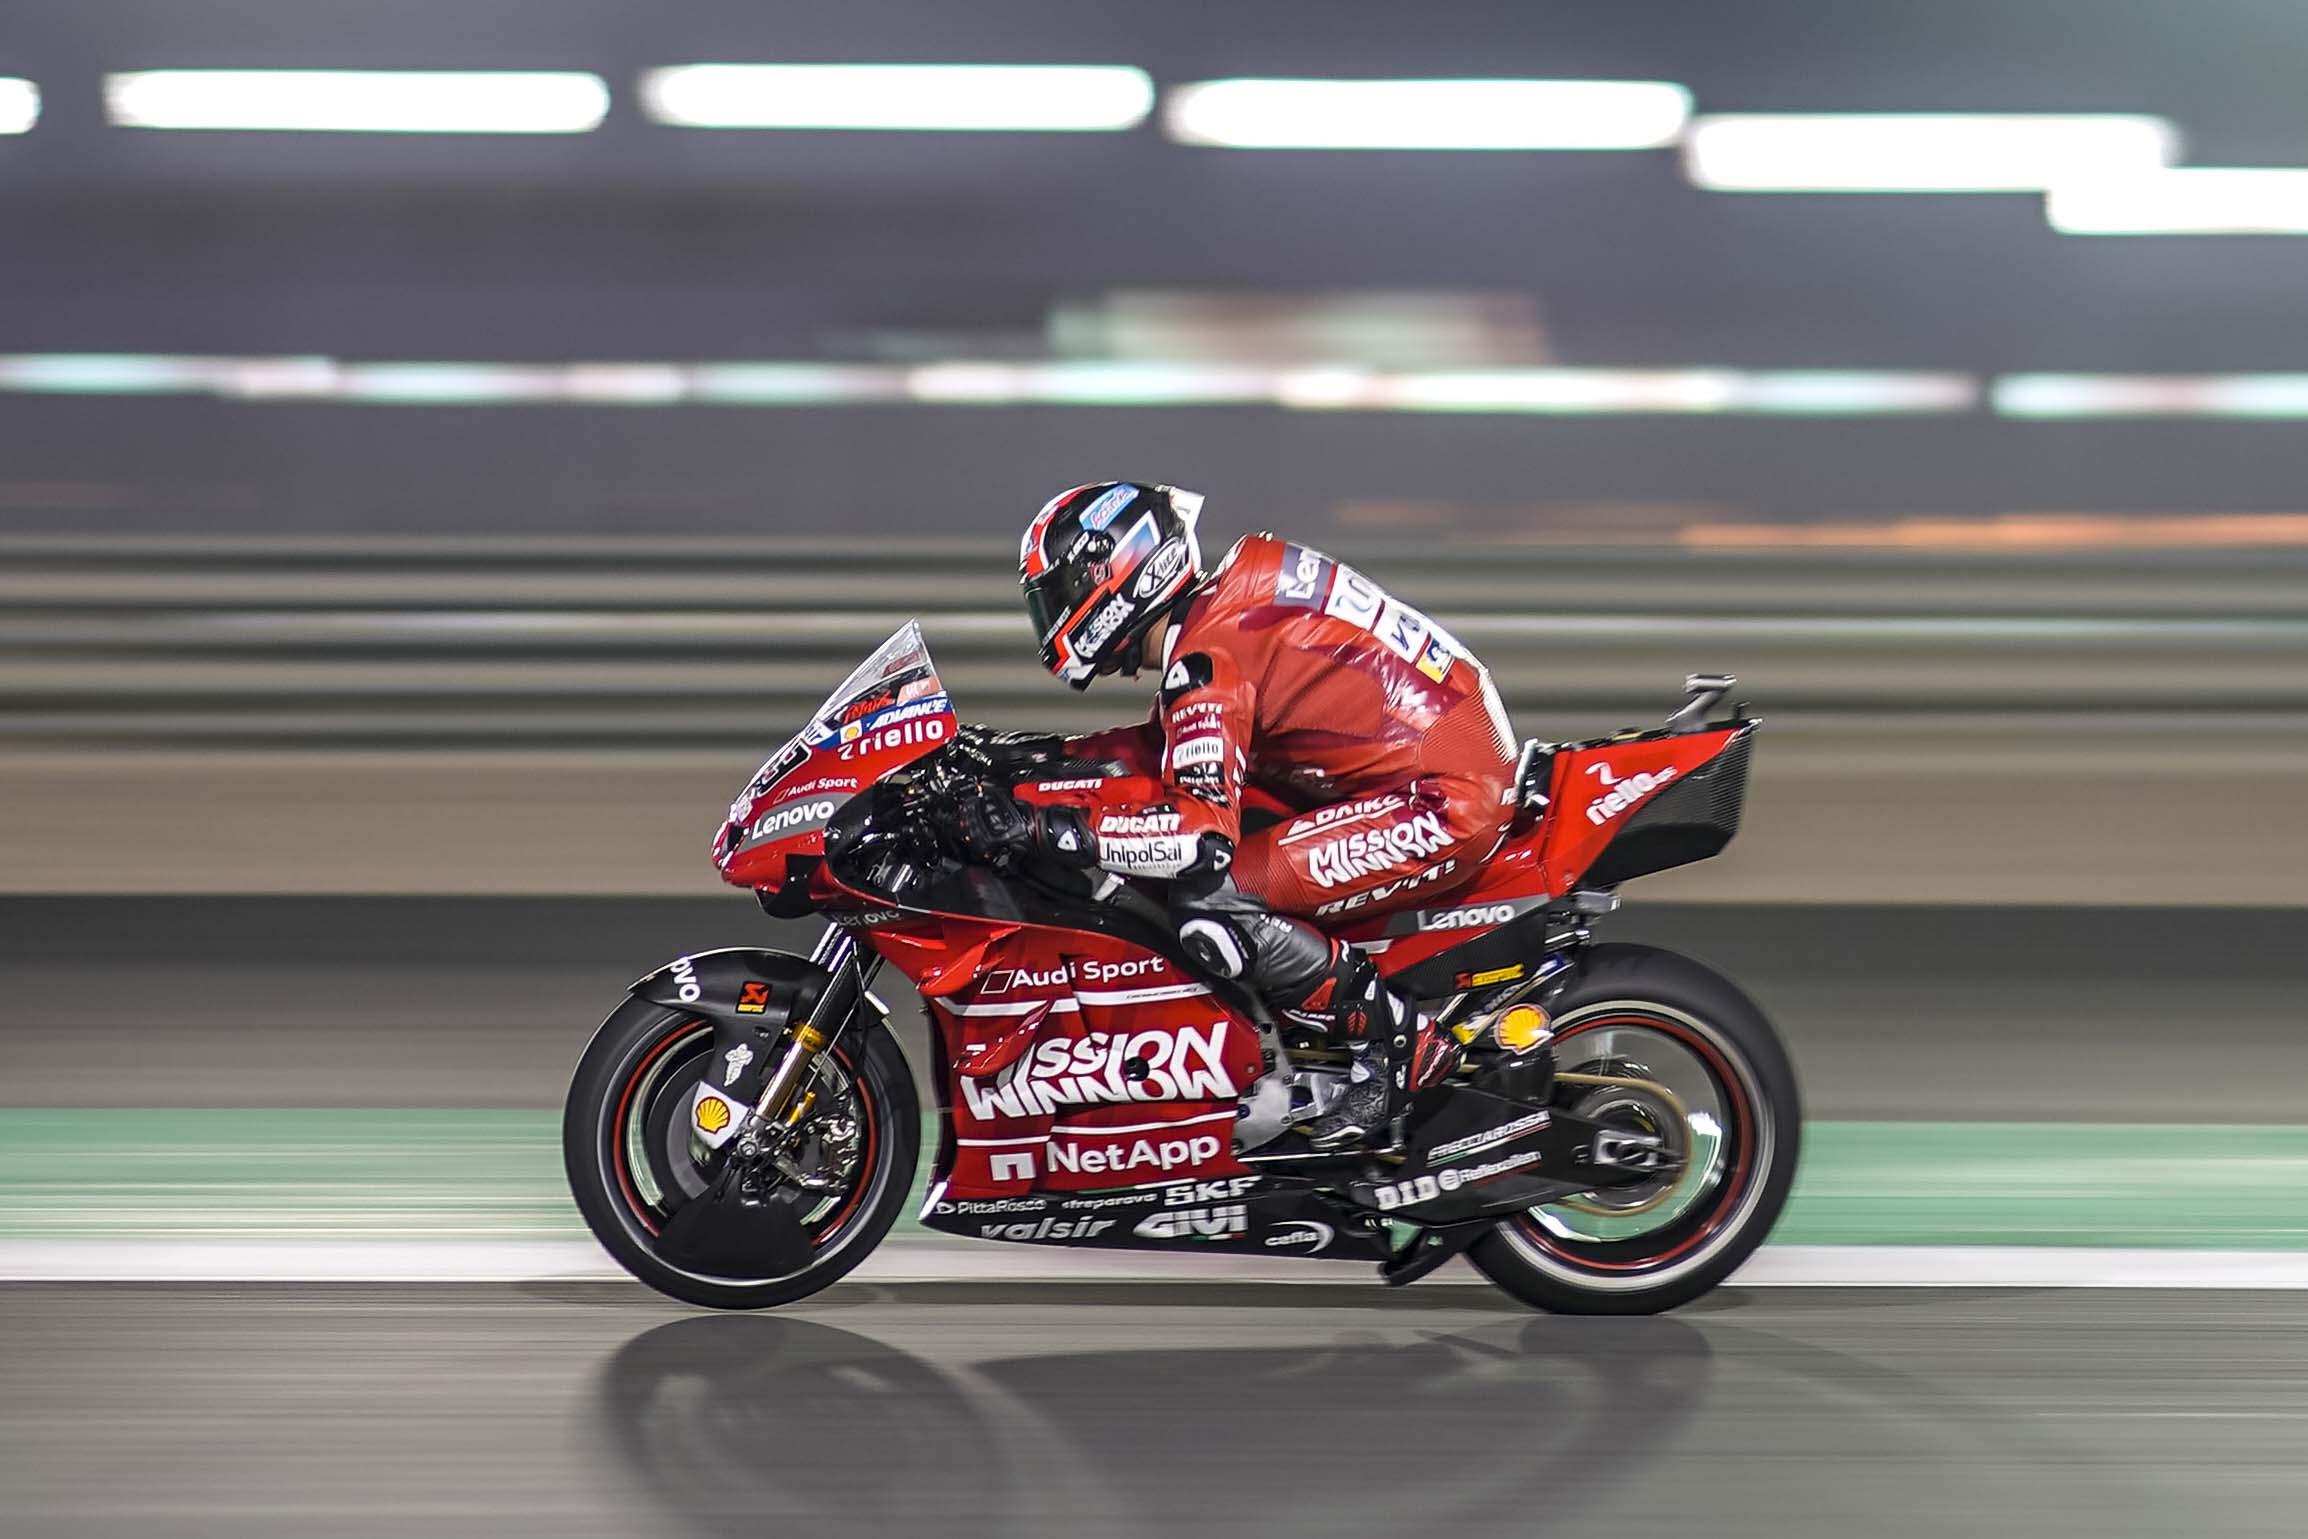 Is Ducati's Aerodynamic Swingarm MotoGP Legal? Factories